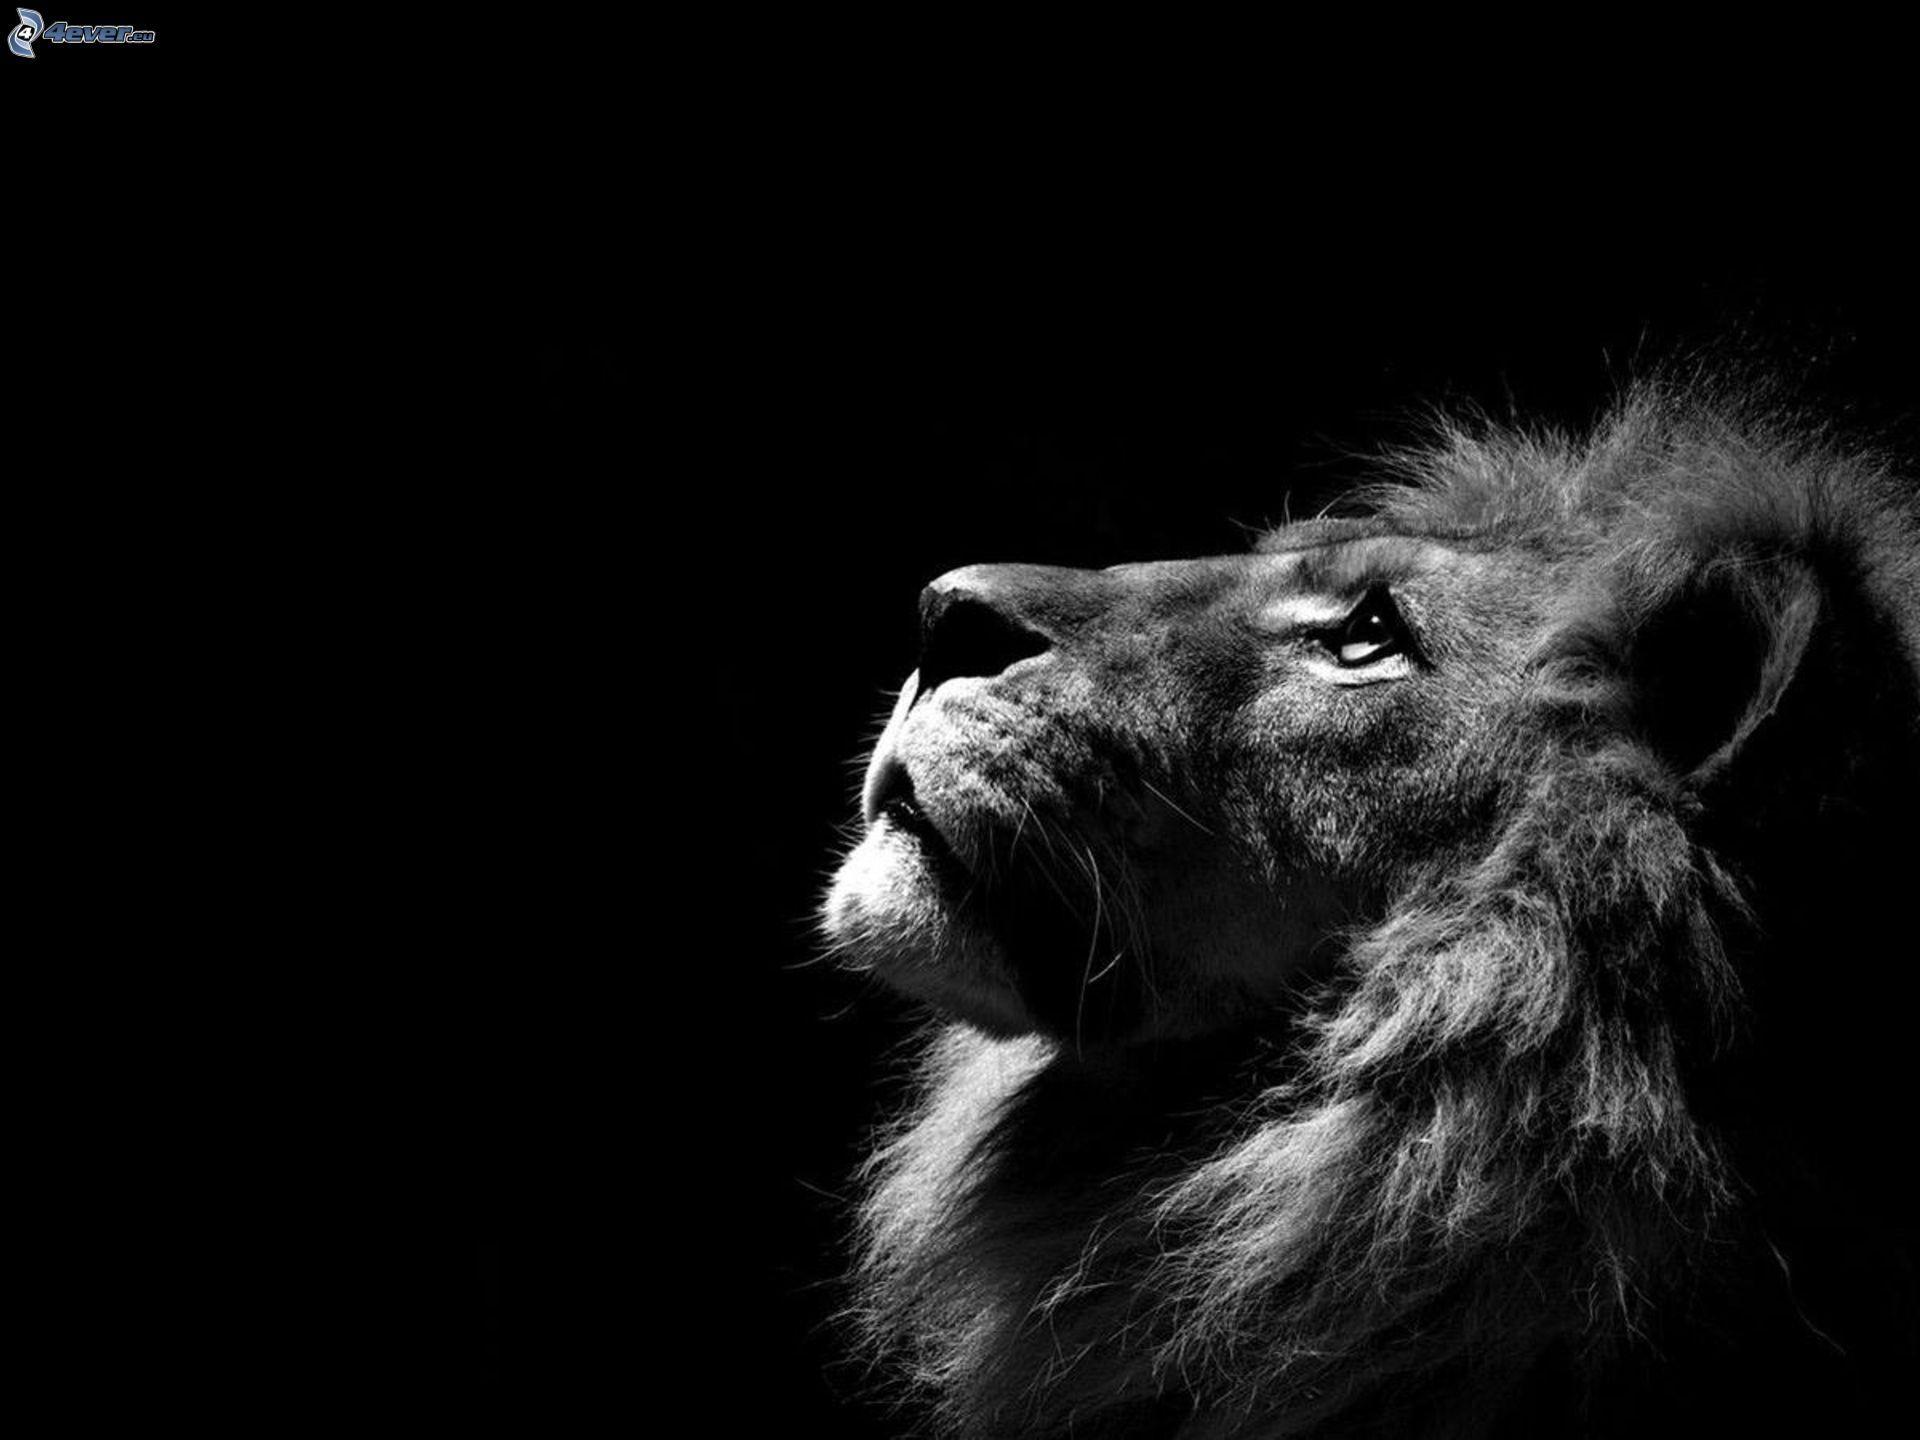 Leone bianco e nero disegni pinterest leone for Sfondi bianco e nero tumblr